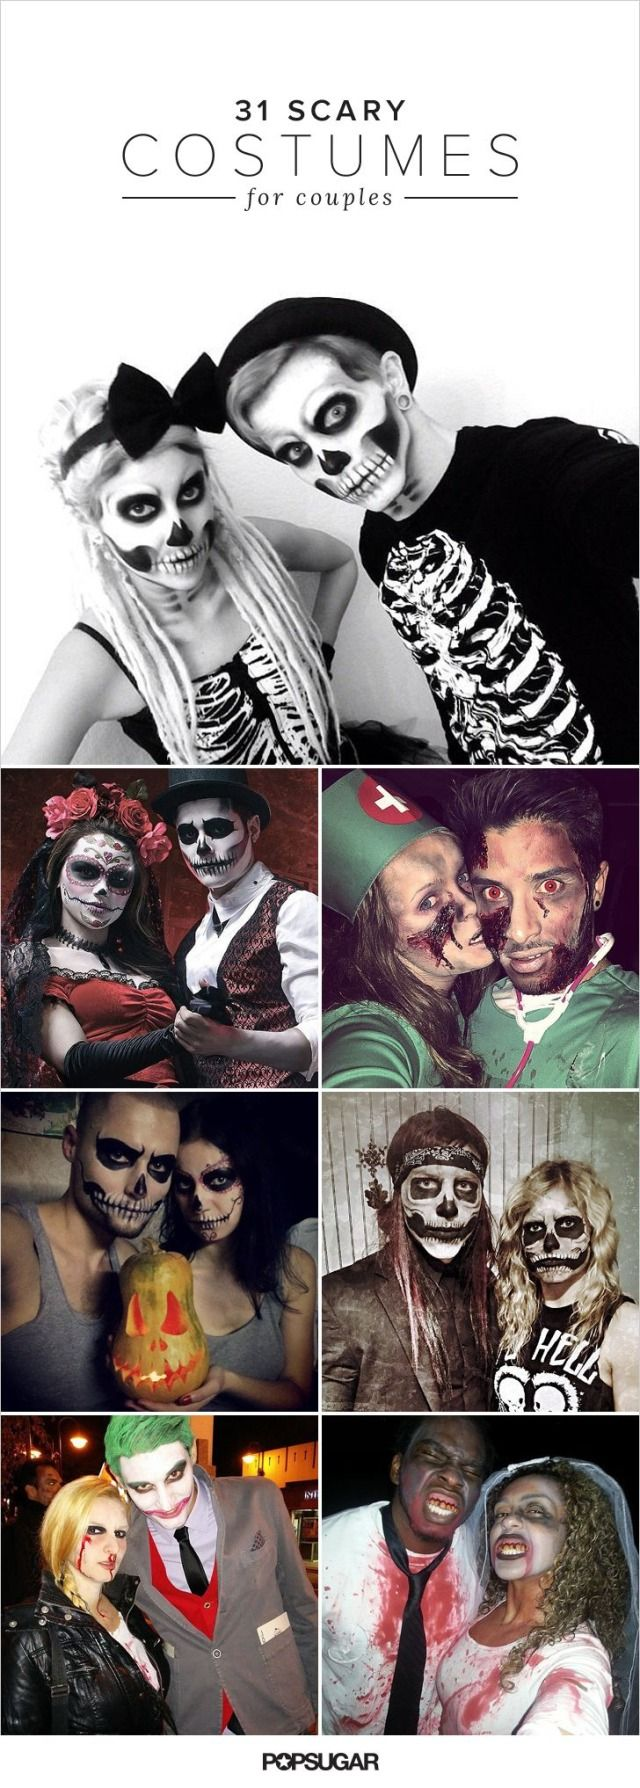 41 best fancy a dress up?? images on Pinterest   Halloween ideas ...